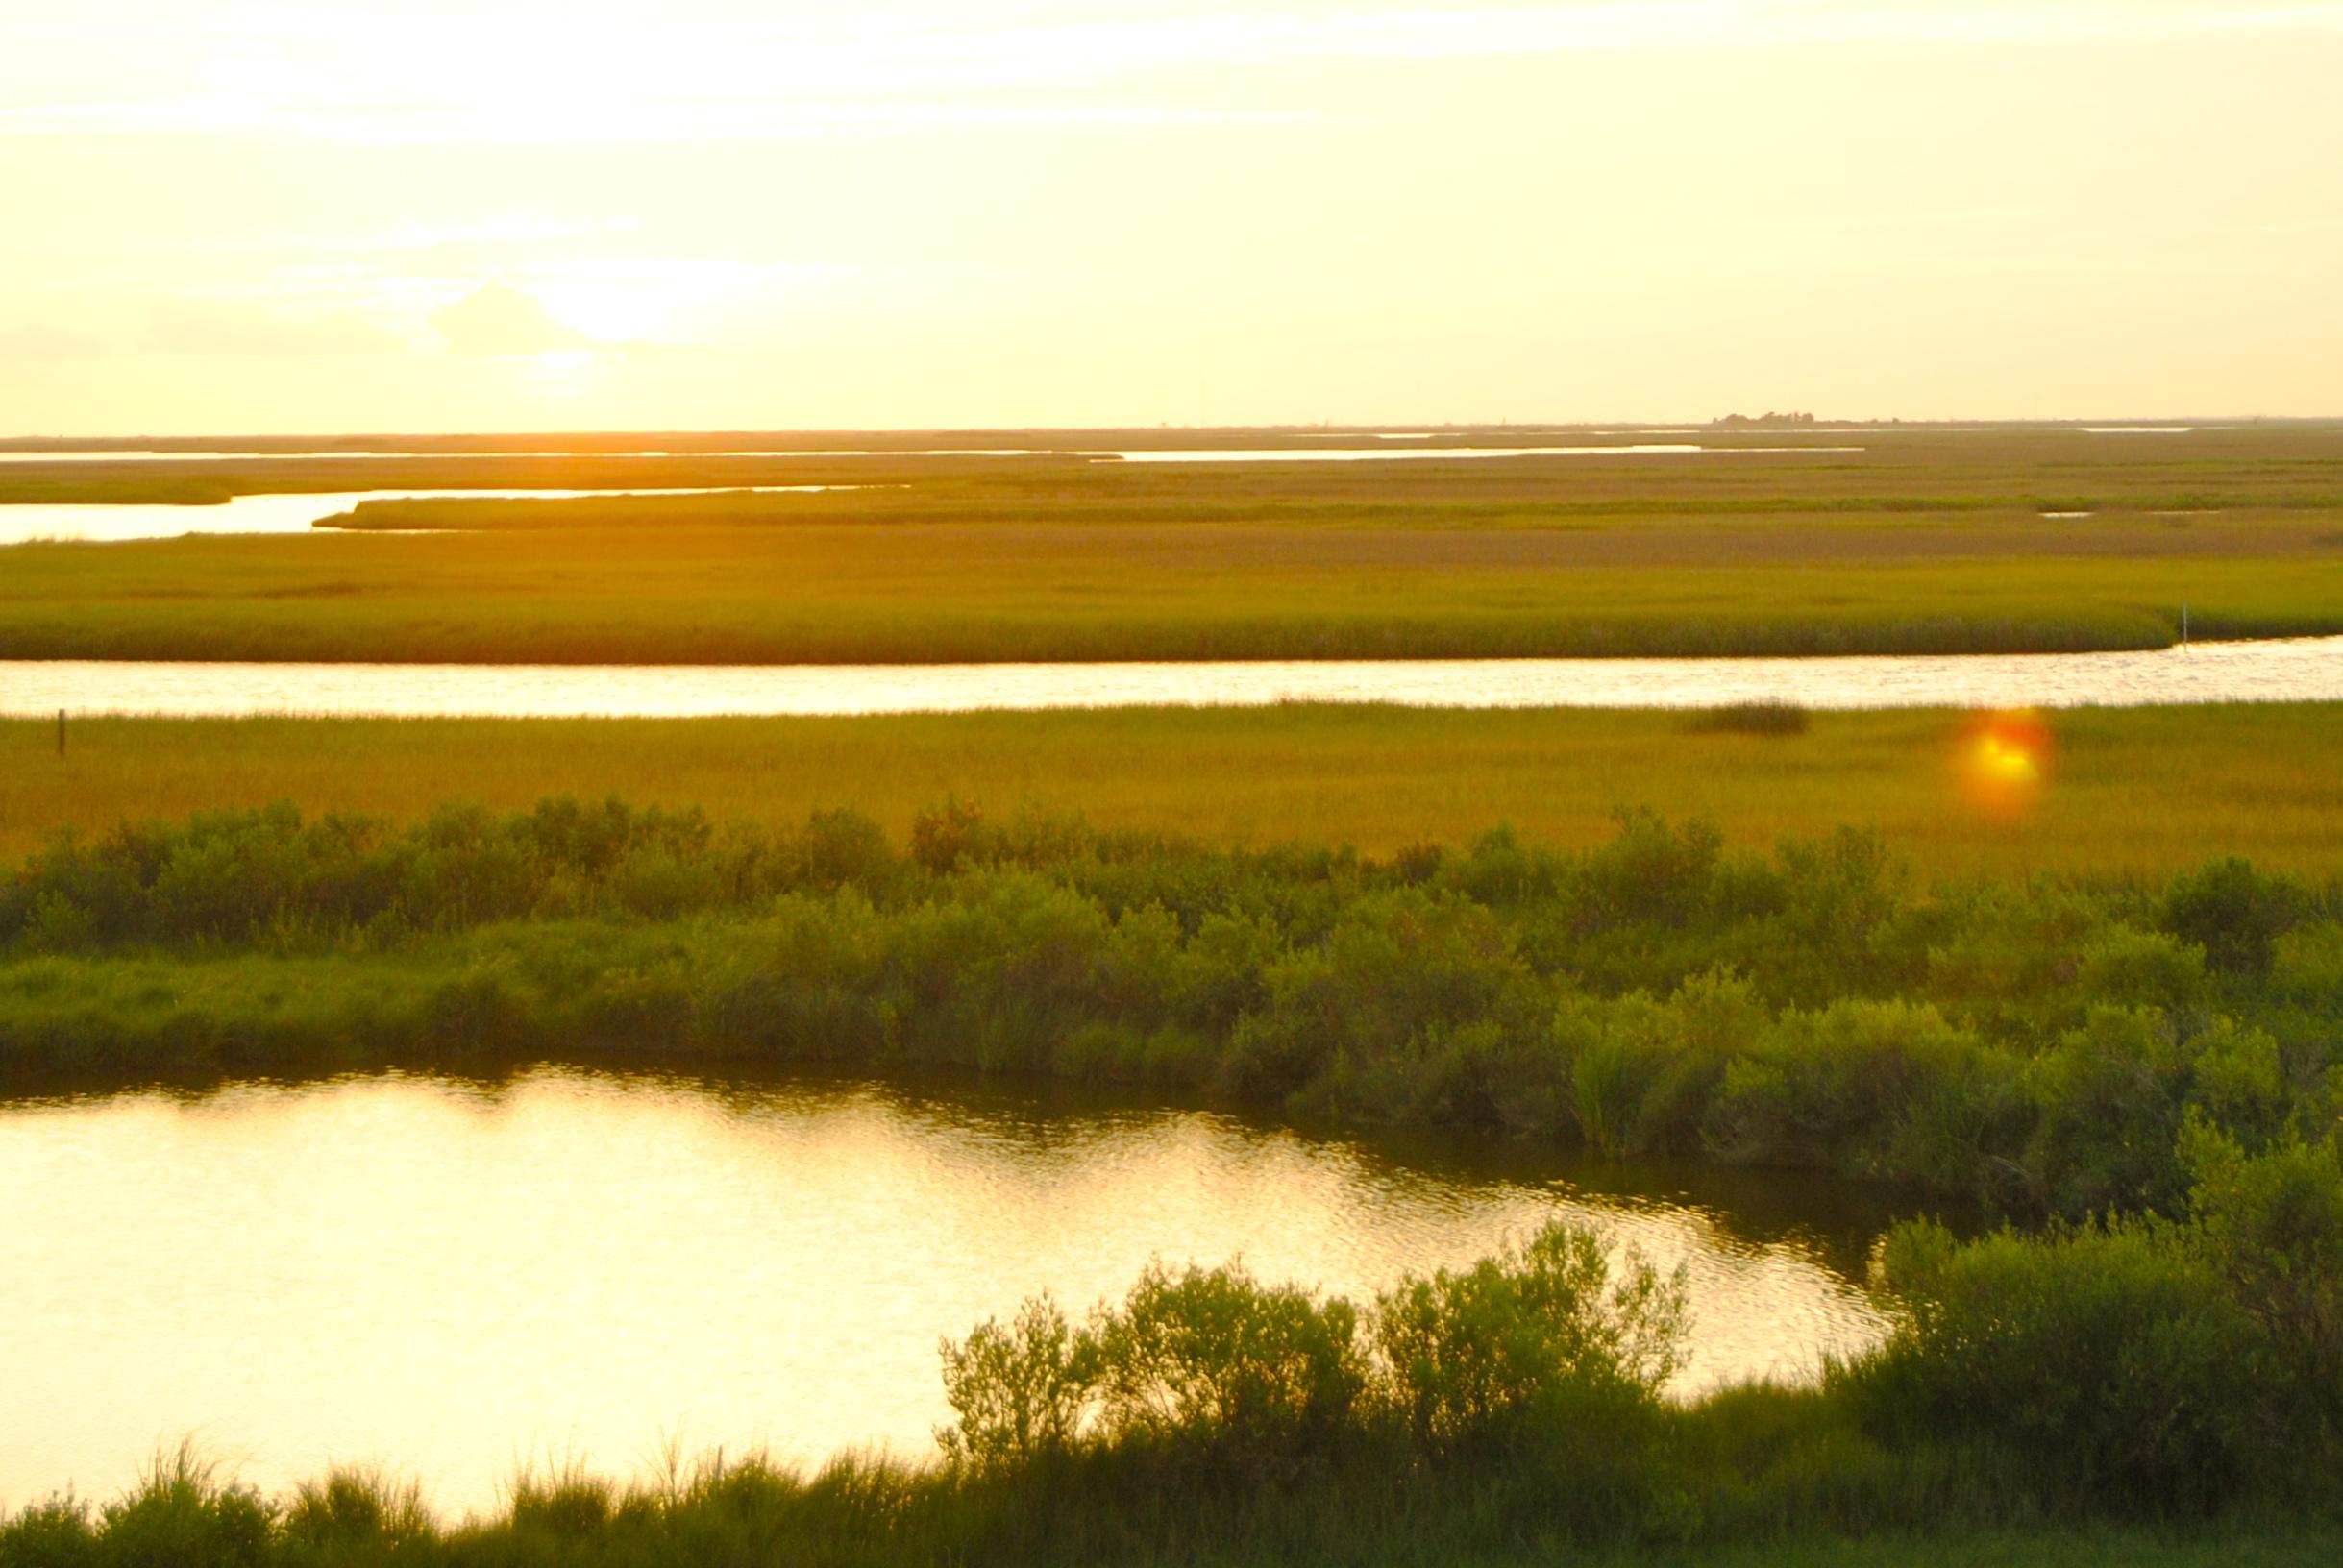 South Louisiana Wetlands Discovery Center |